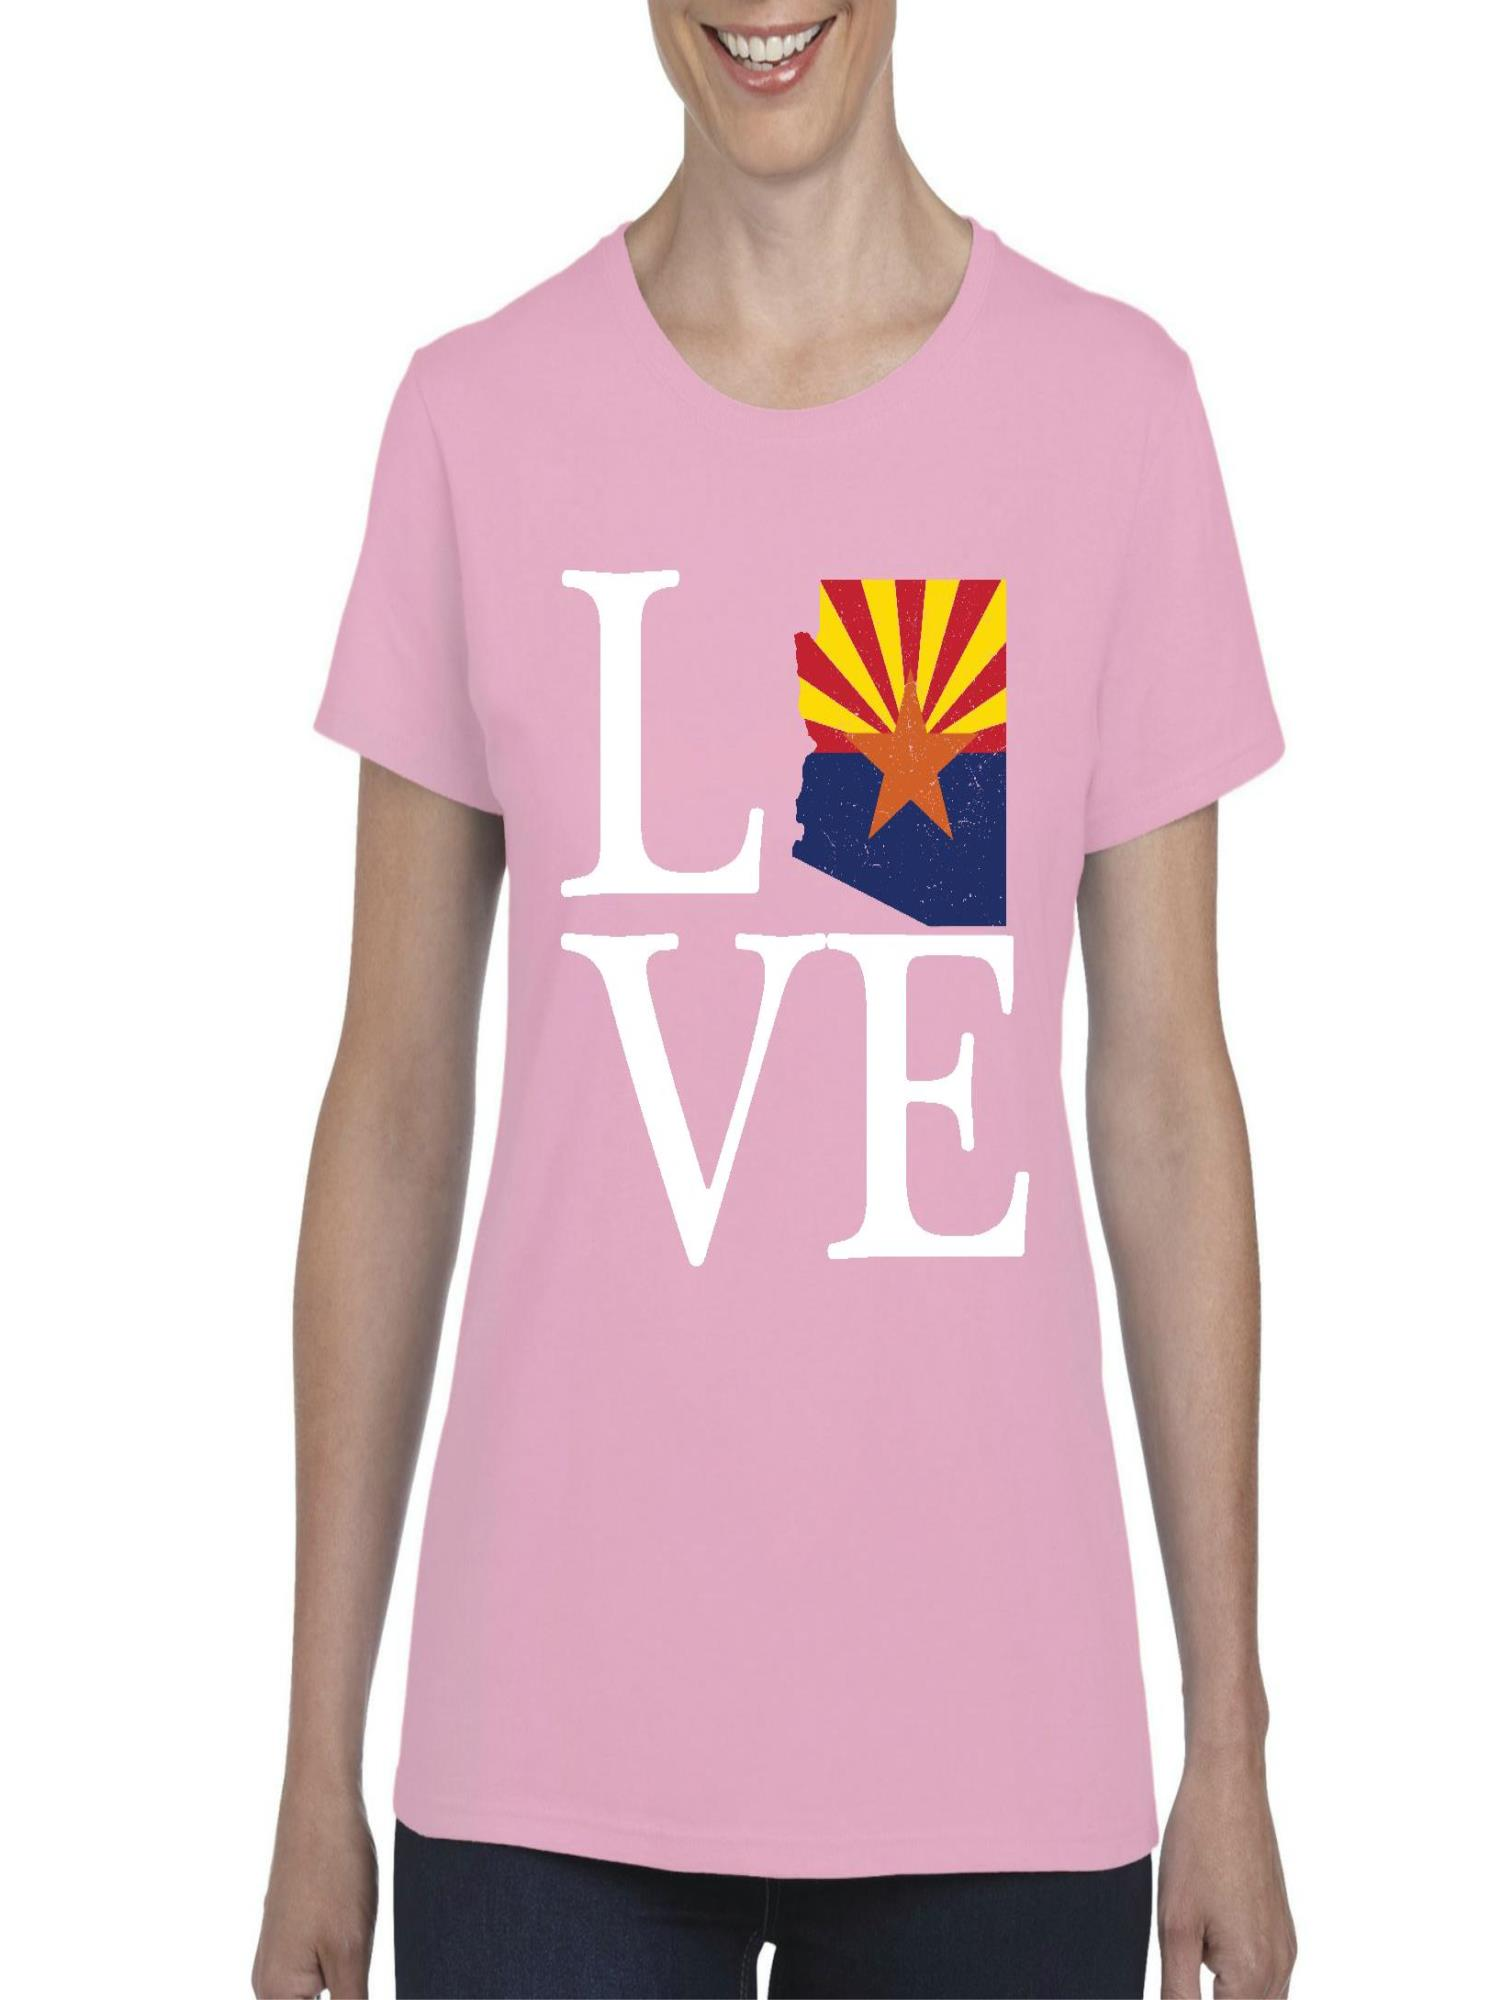 Love Arizona  Women Shirts T-Shirt Tee